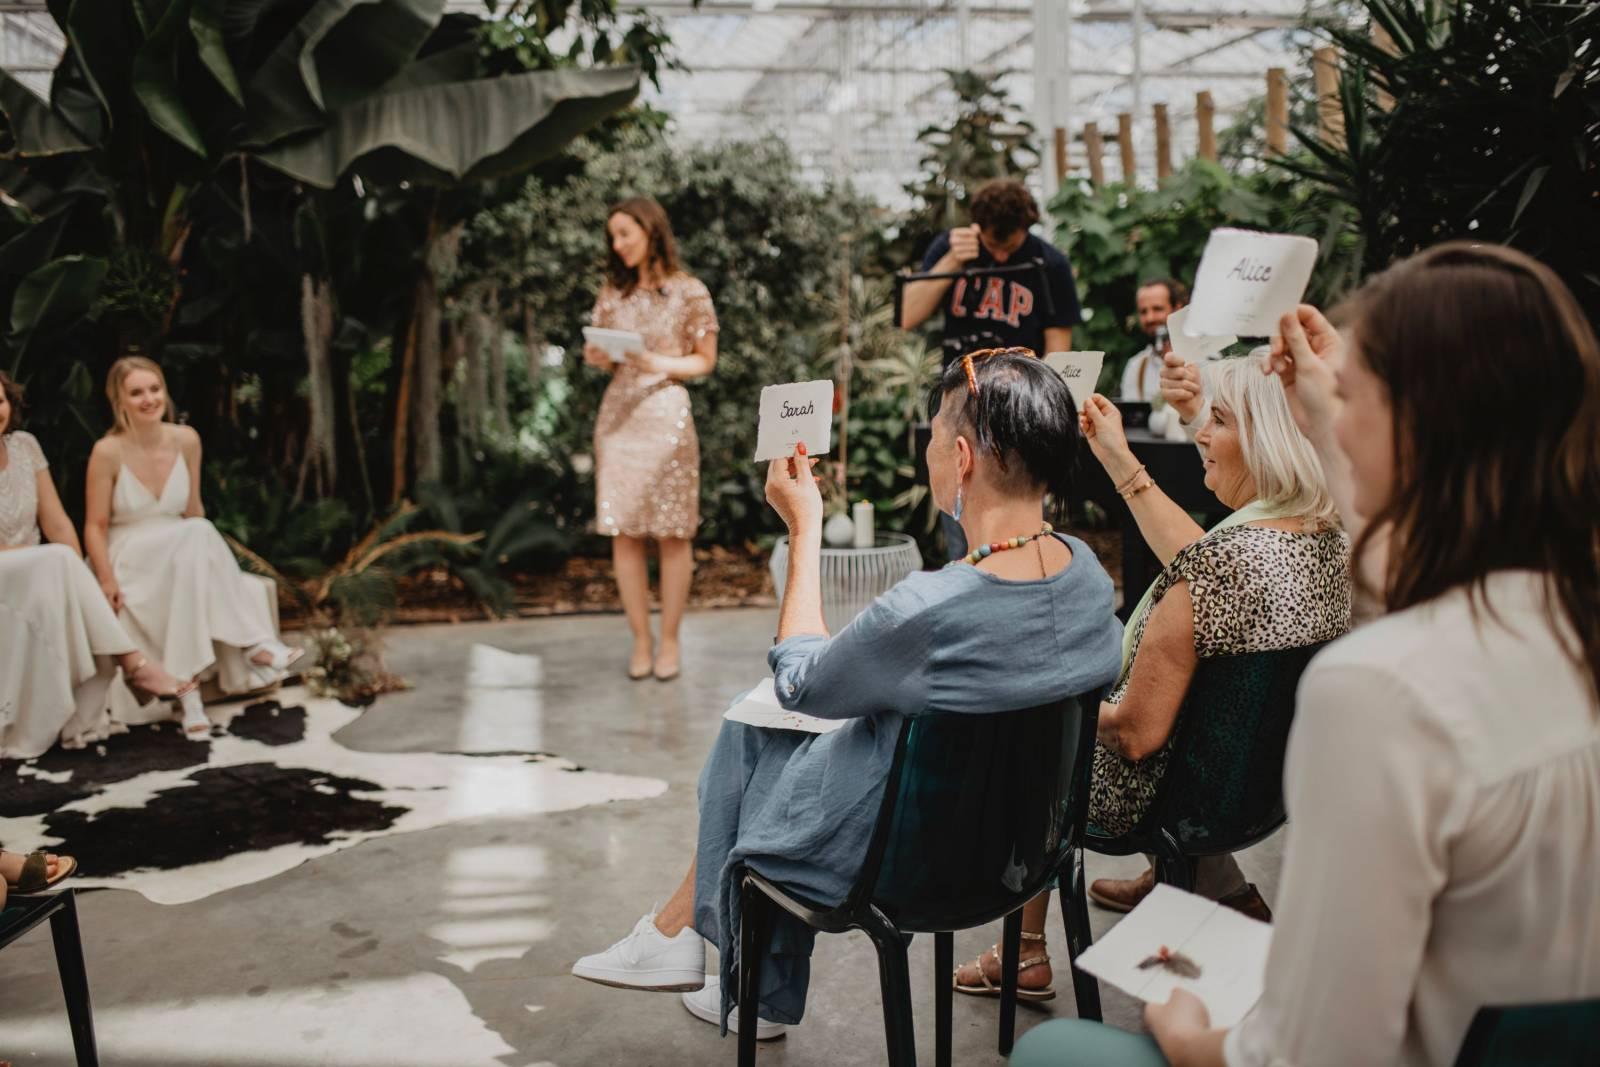 Merveil - Ceremoniespreker - IrmyPhotography - House of Weddings - 7